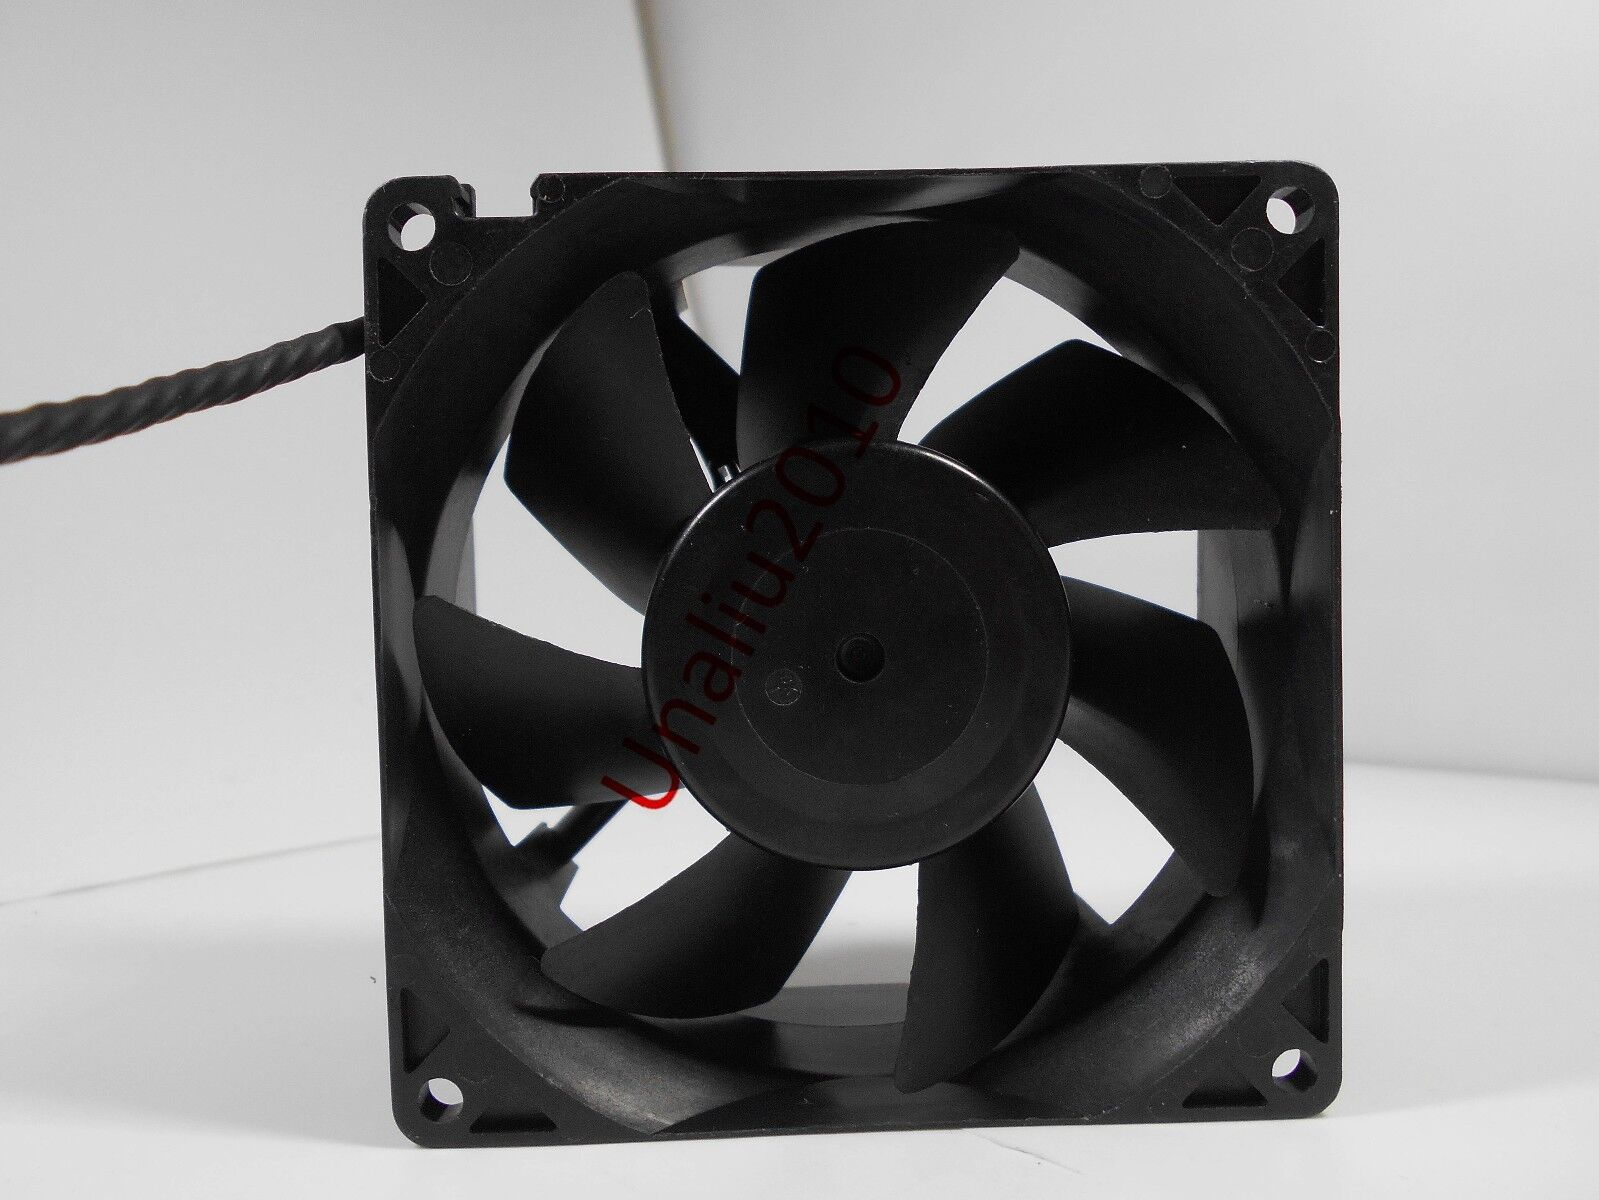 NIDEC M35556-35 DEL3F fan 92*92*38mm 12V 1A 4pin for DELL POWEREDGE T300